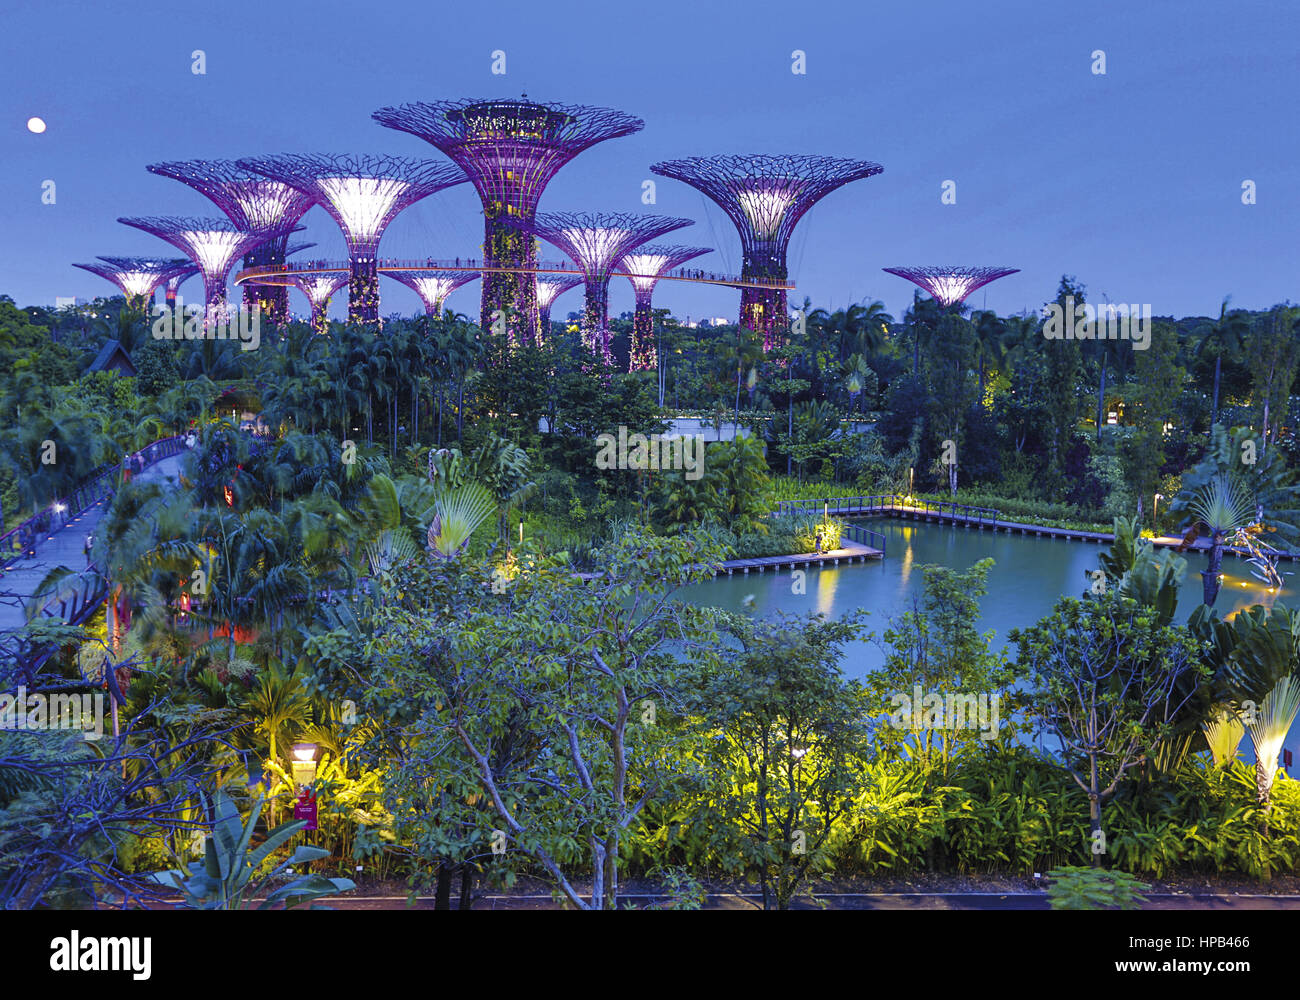 Singapur, Botanischer Garten - Stock Image